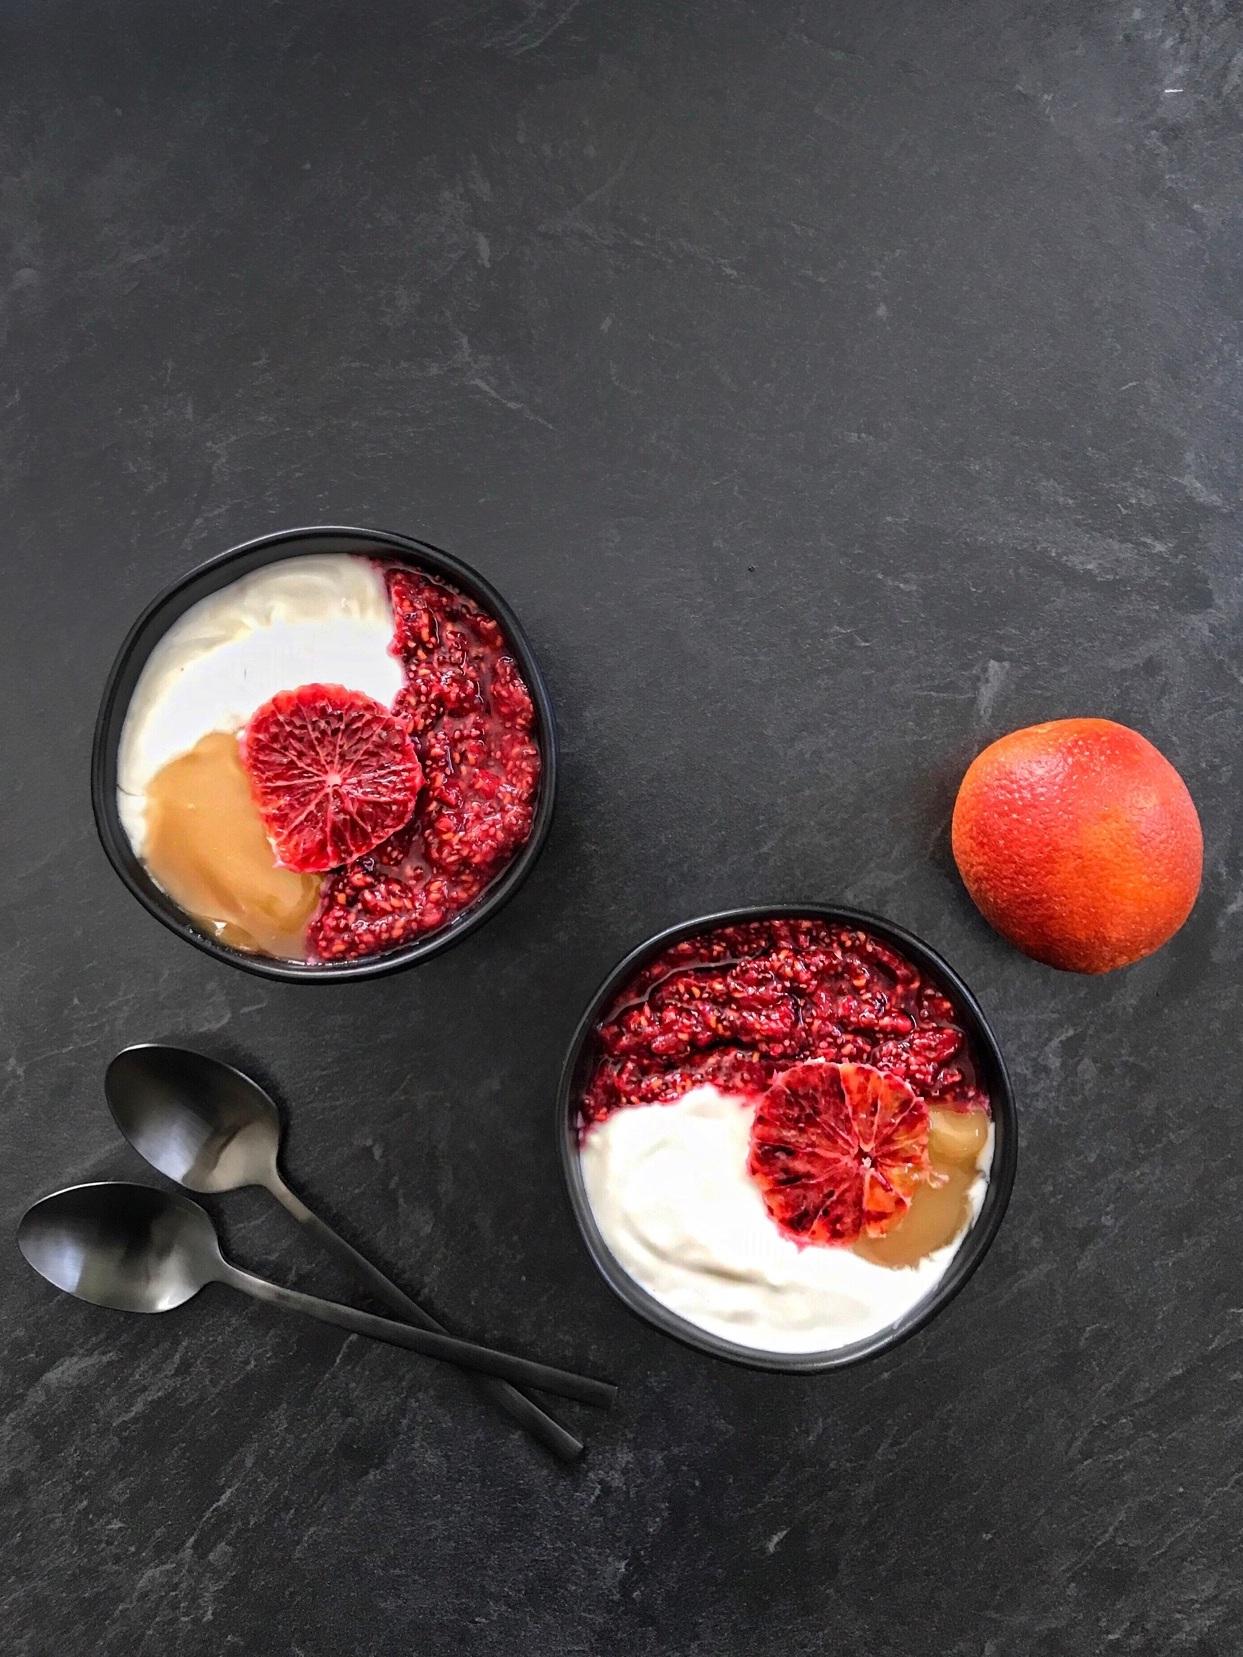 Haus+of+Ojas+Recipes+%7C+Bloodorange+Chia+Seed+Pudding.jpg